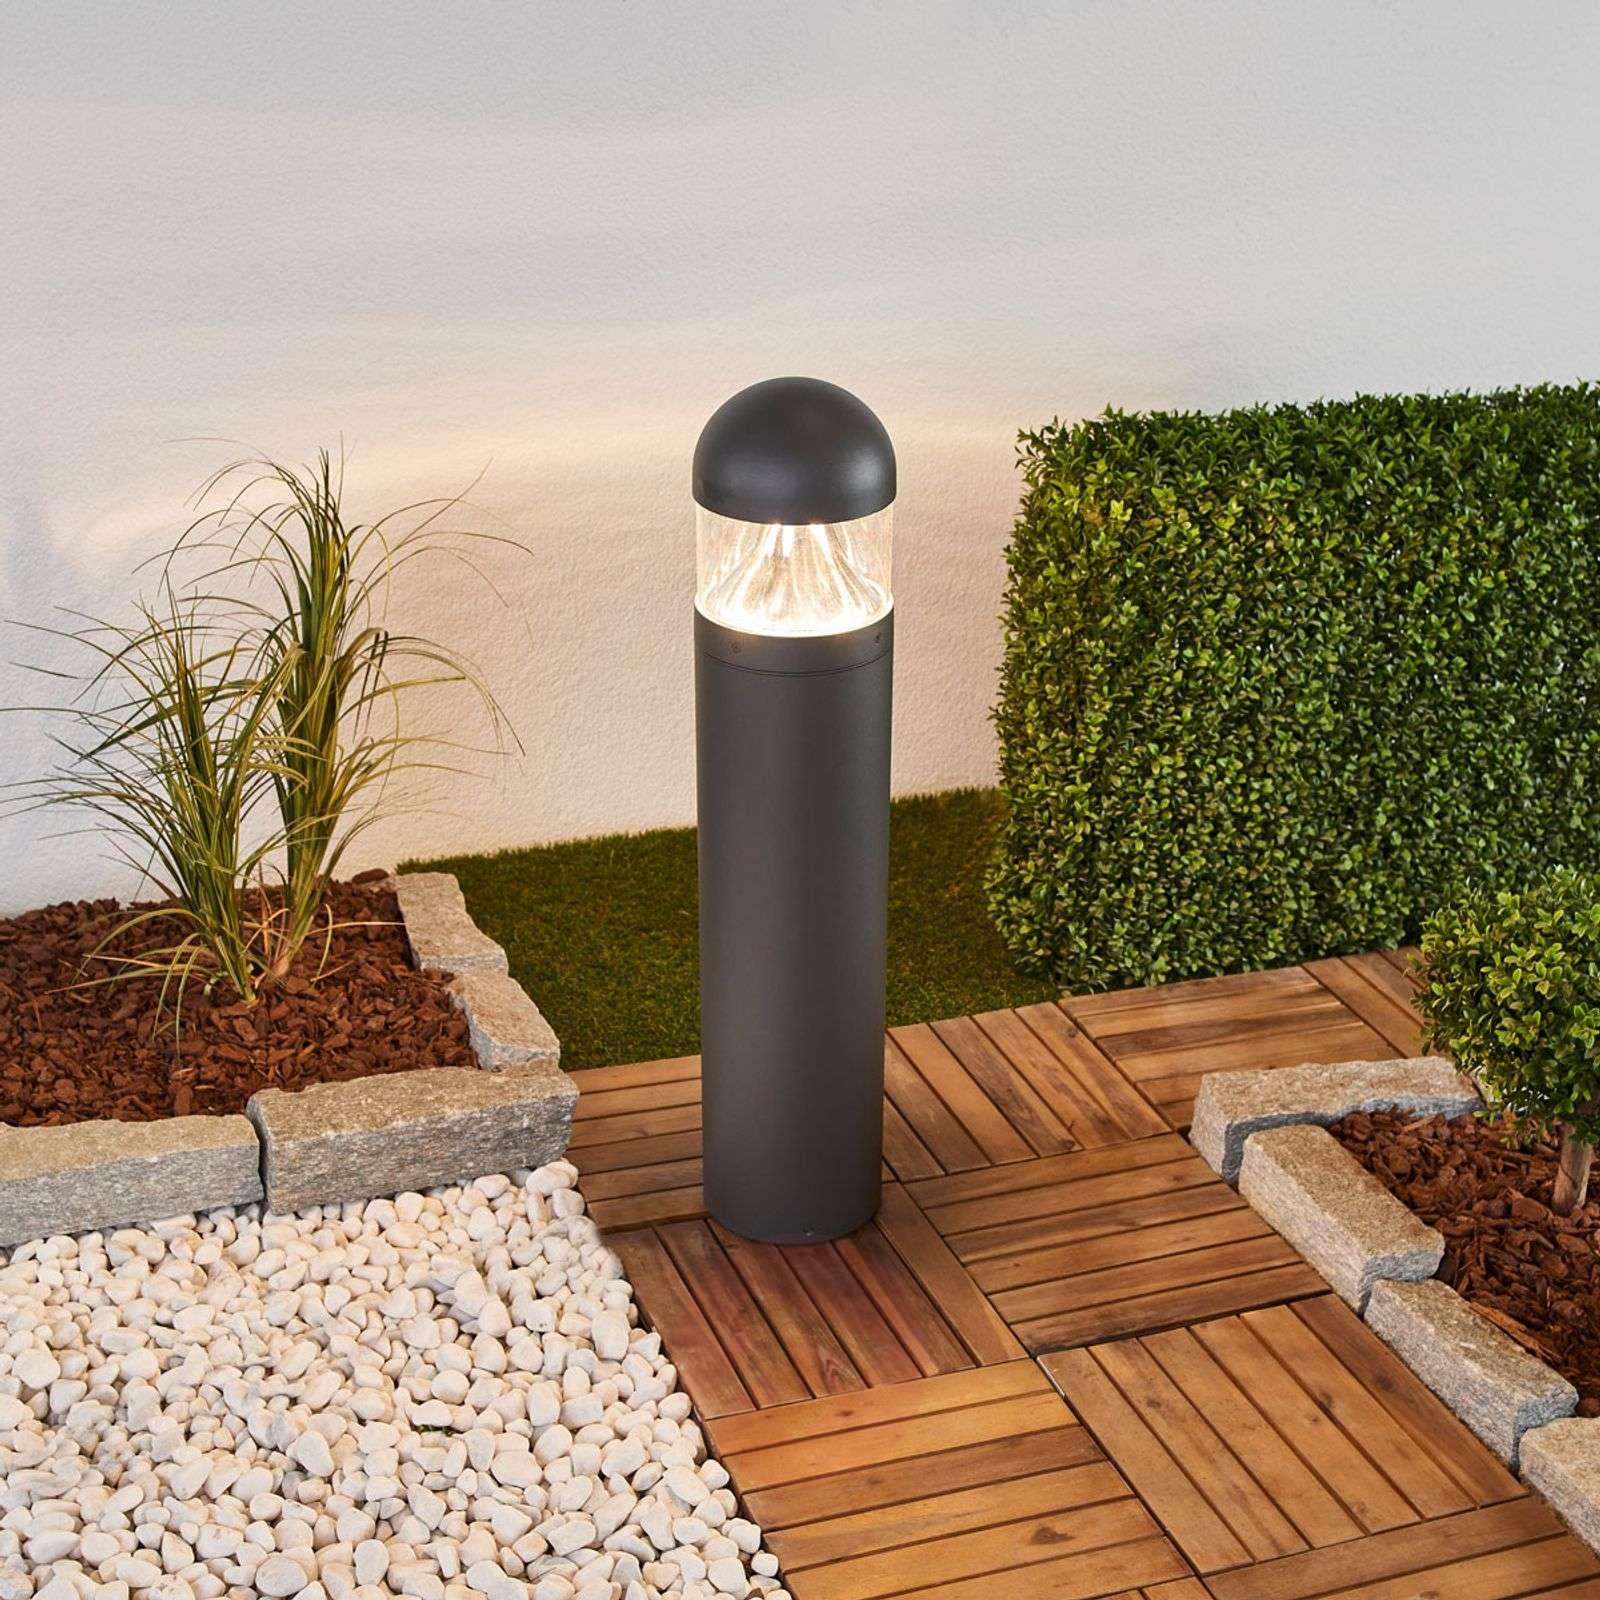 Meva round, bright LED path lamp